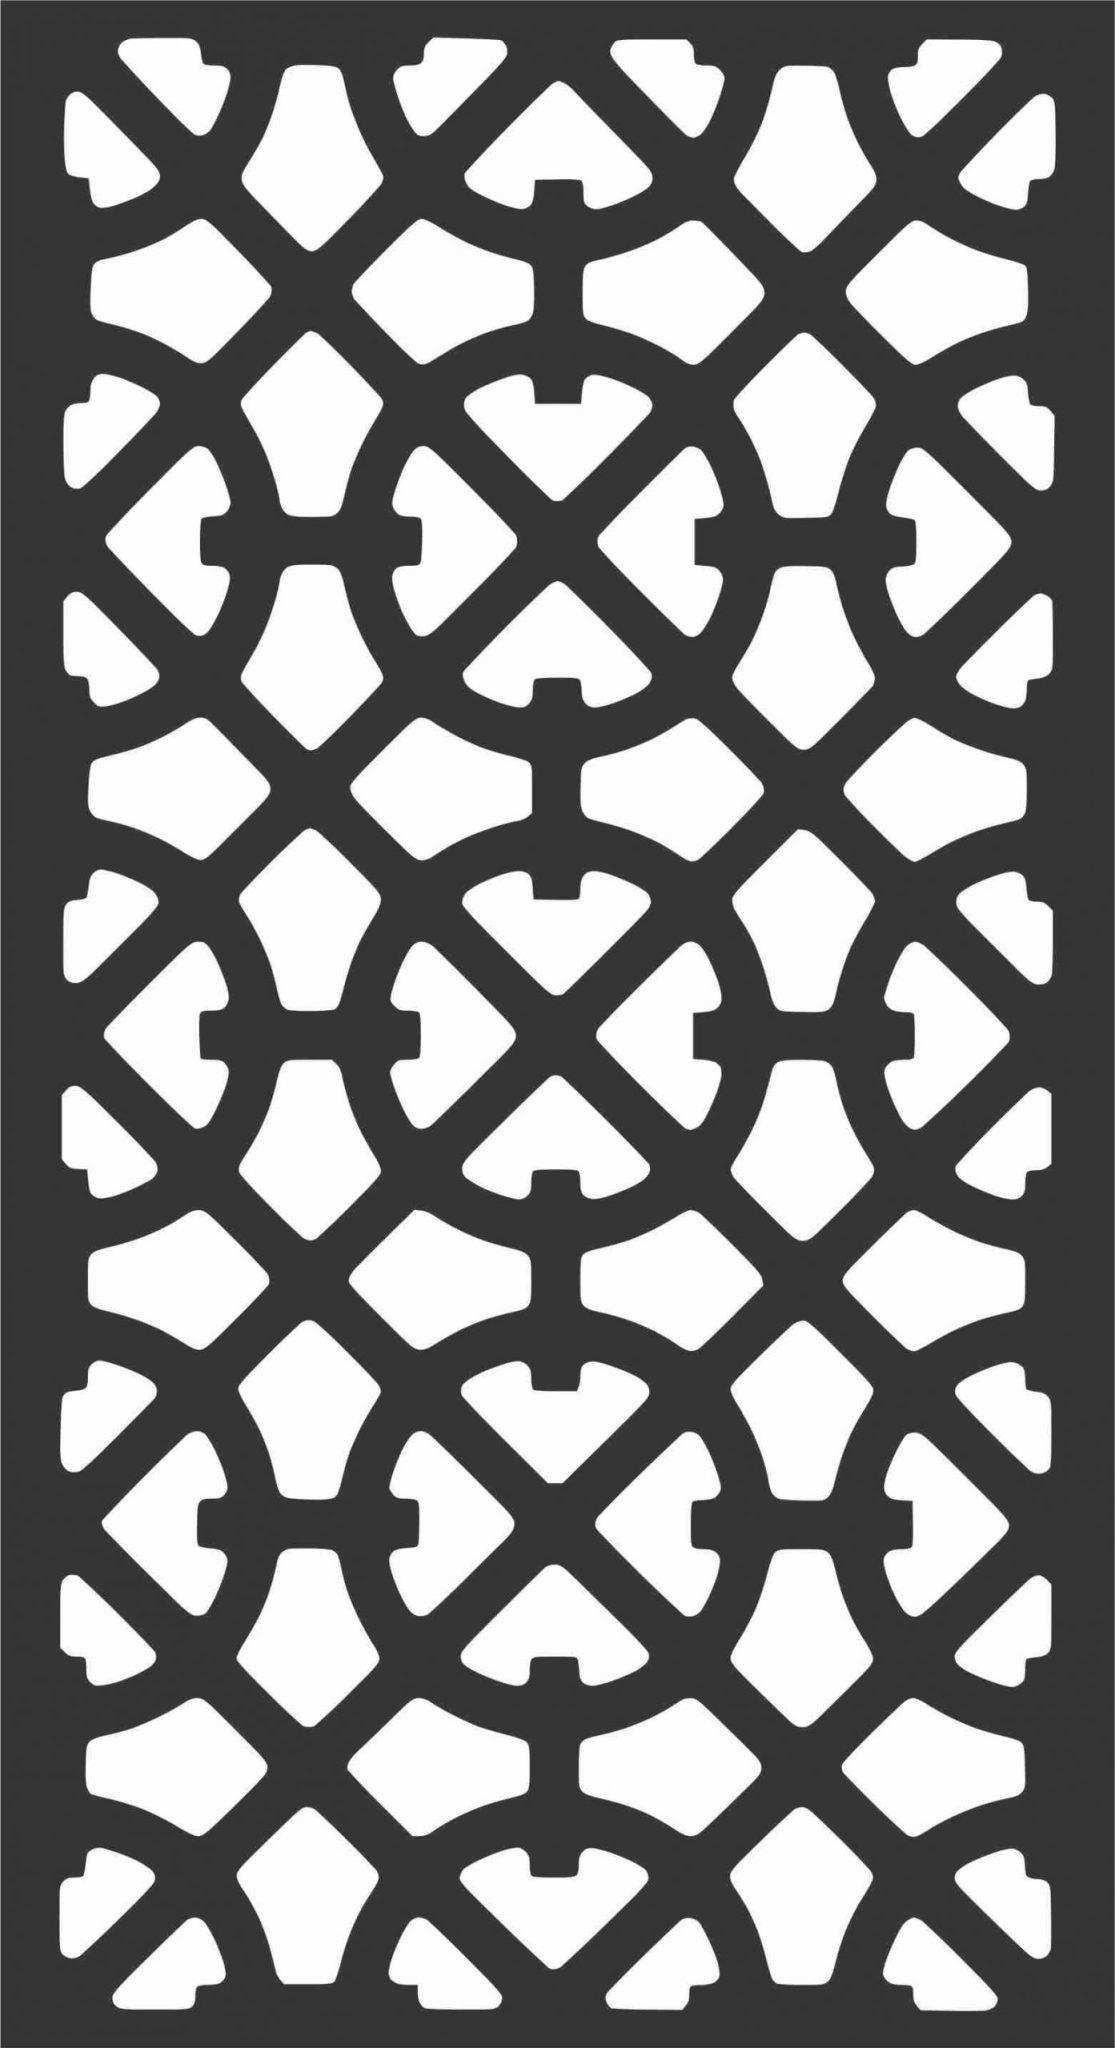 Screen Panel Patterns Seamless 80 Free DXF File